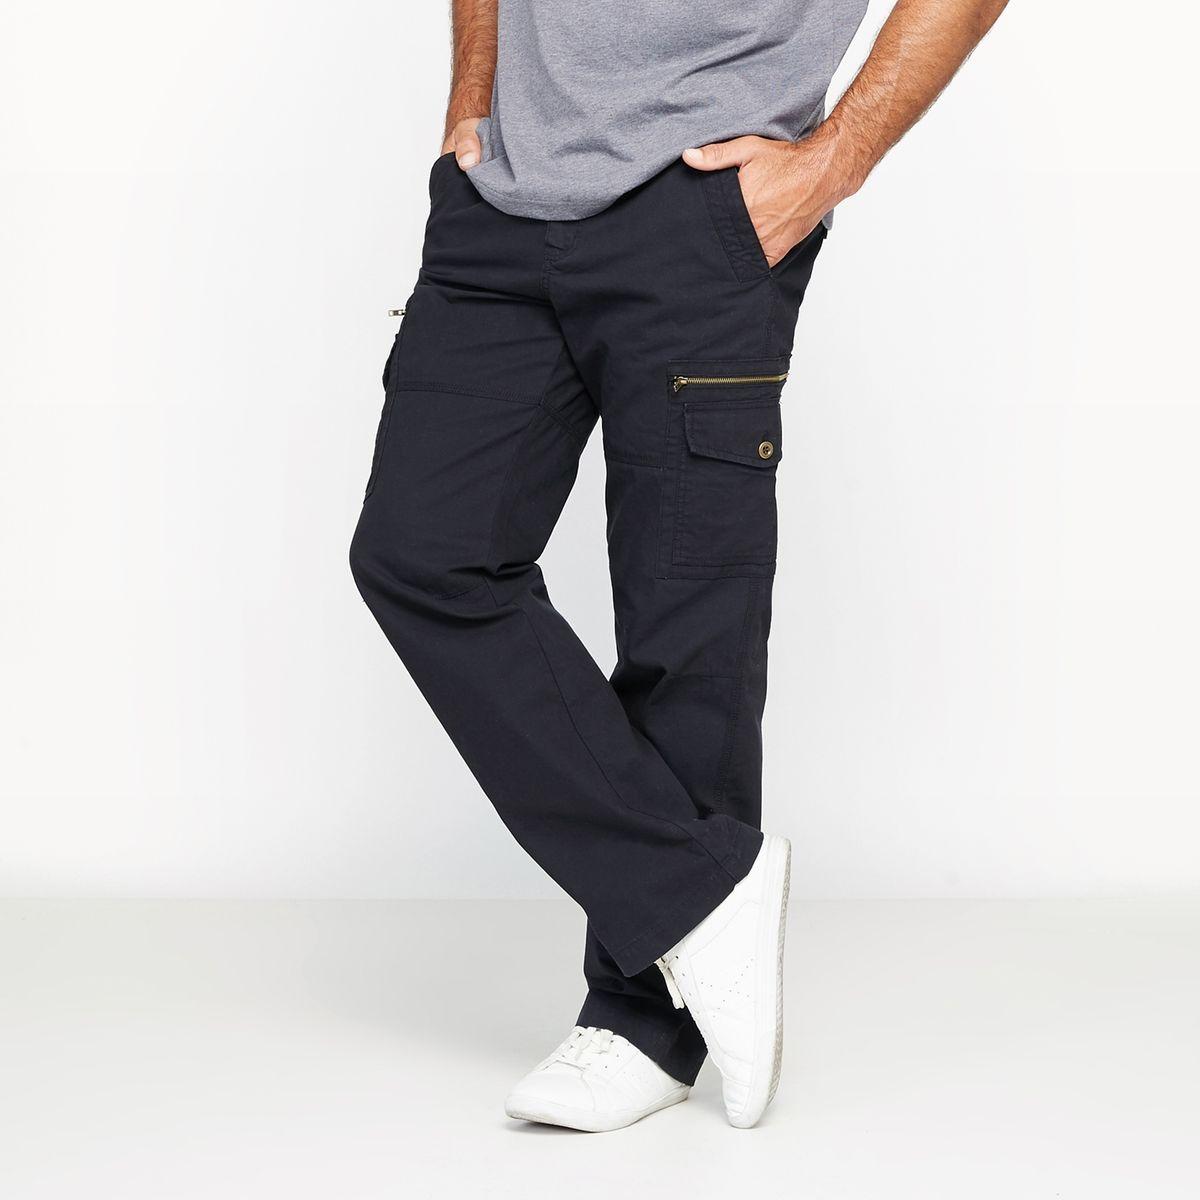 Pantalon sportwear  cargo pur coton